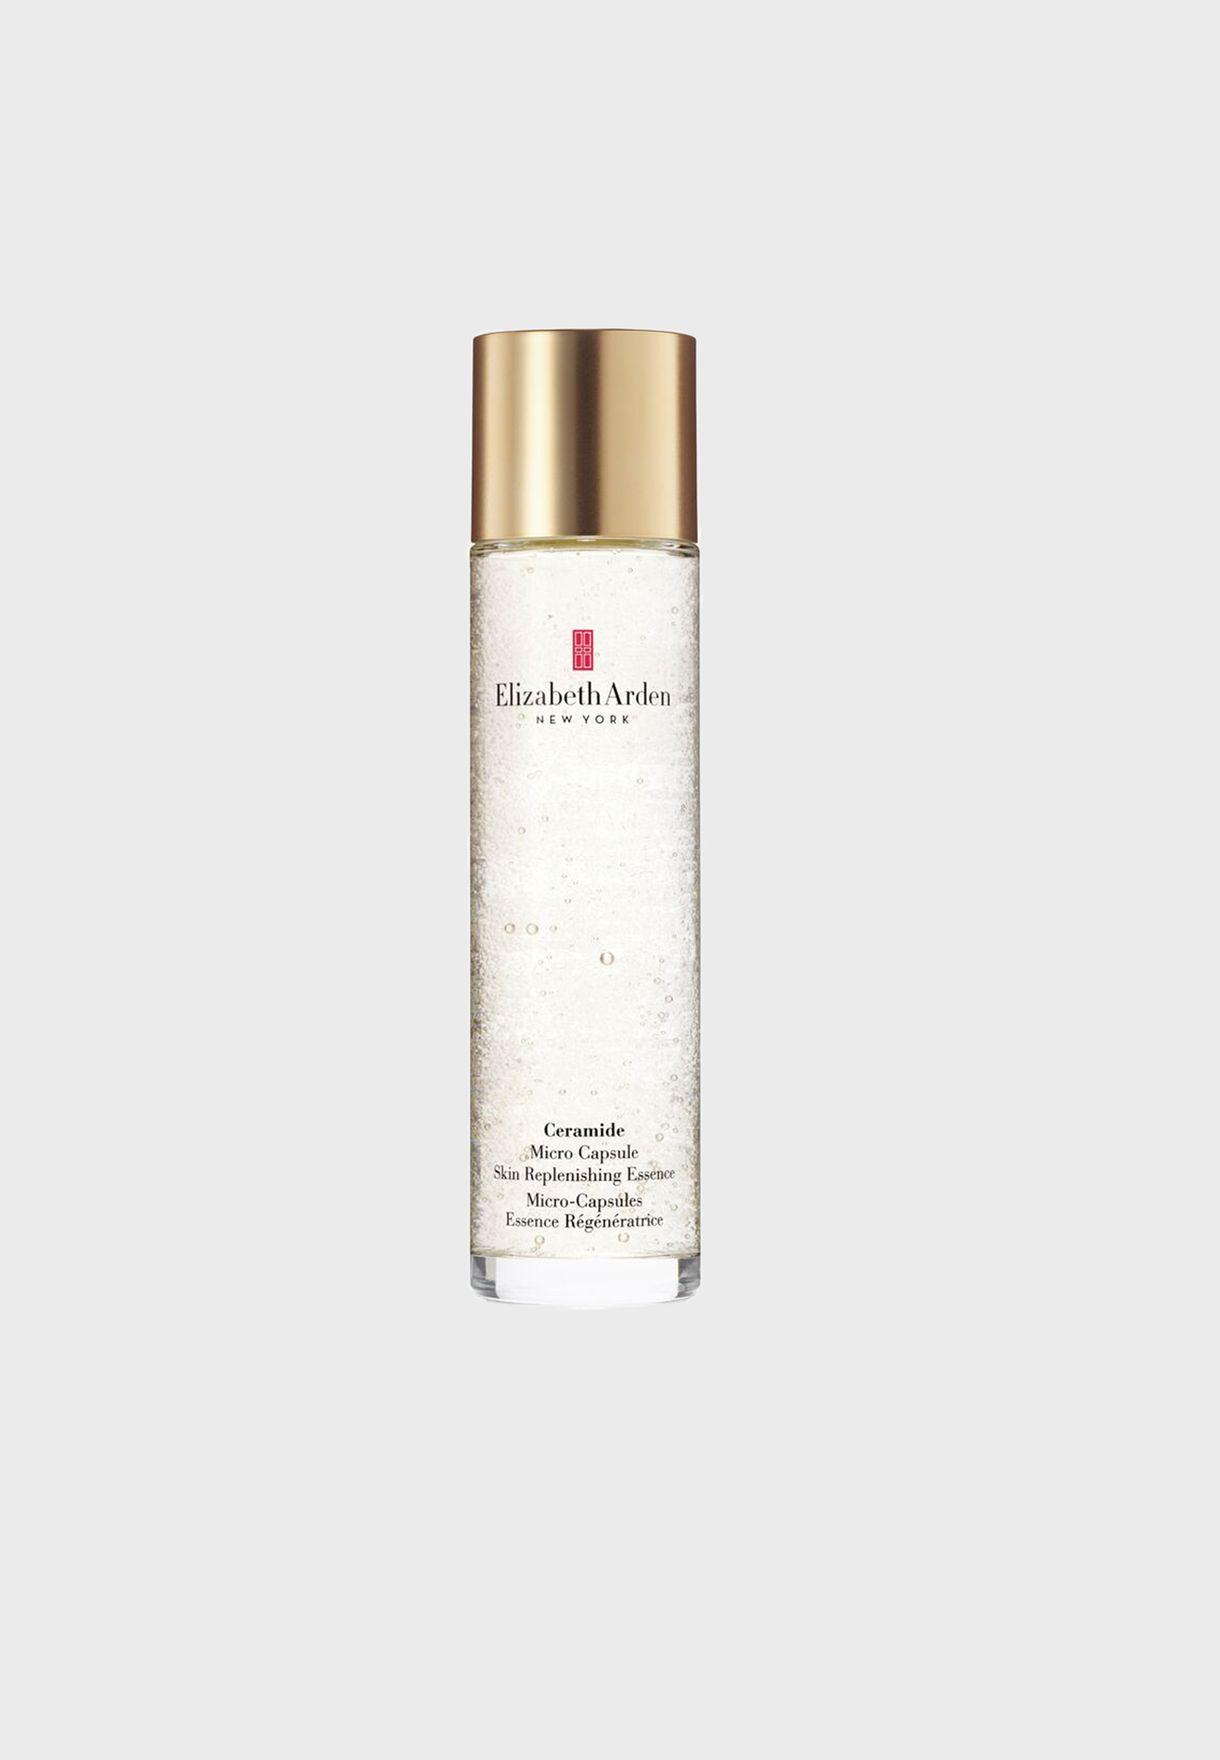 Ceramide Micro Capsule Skin Replenishing Essence